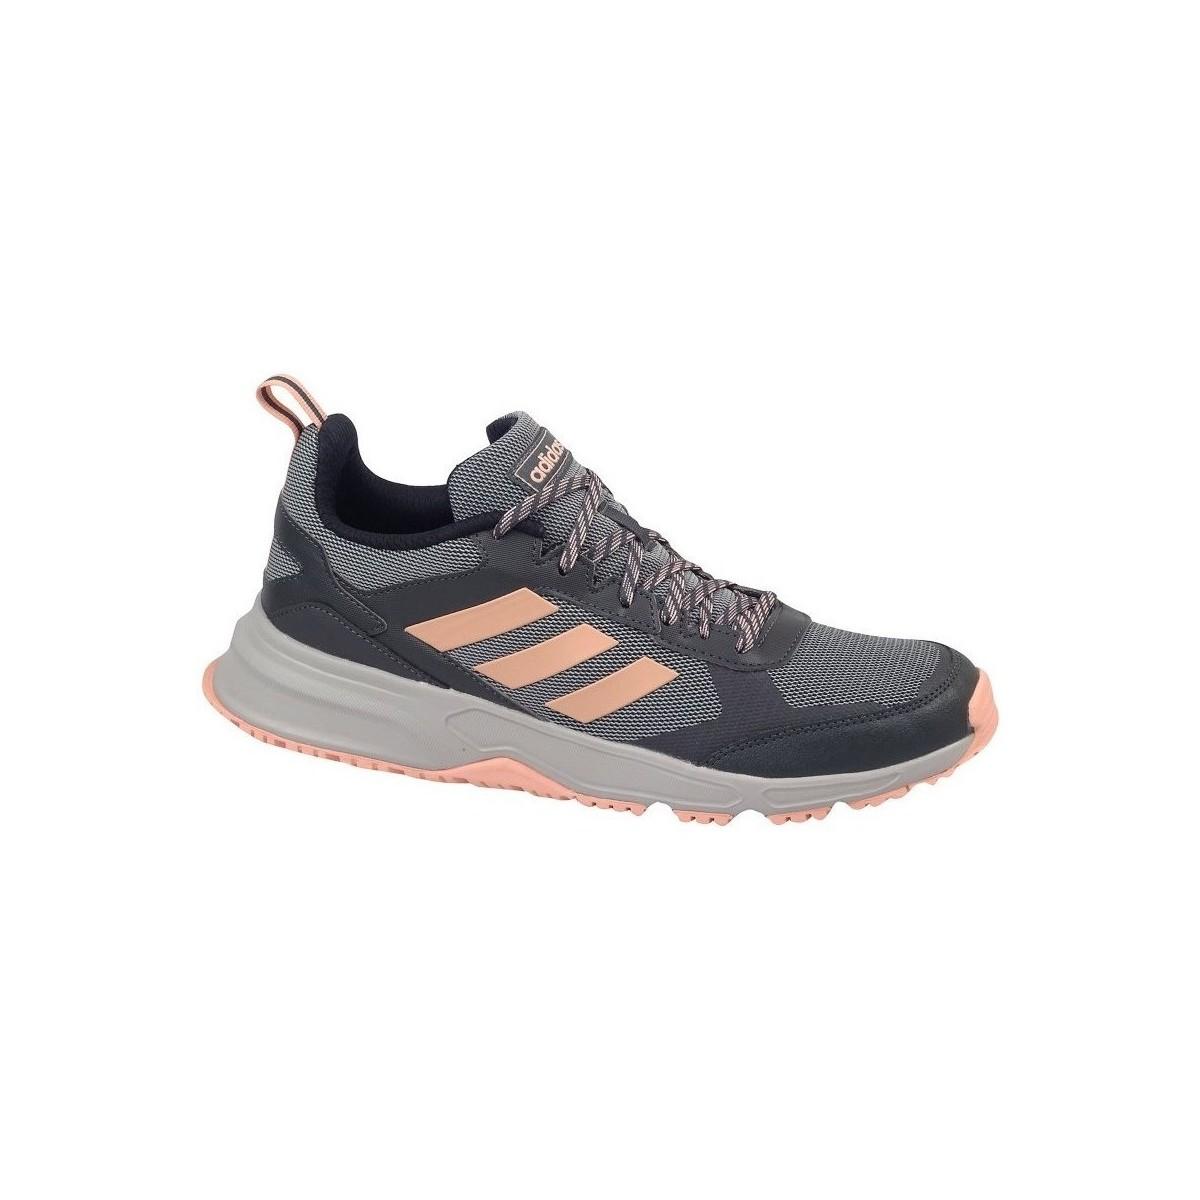 Sneakers adidas  Rockadia Trail 30